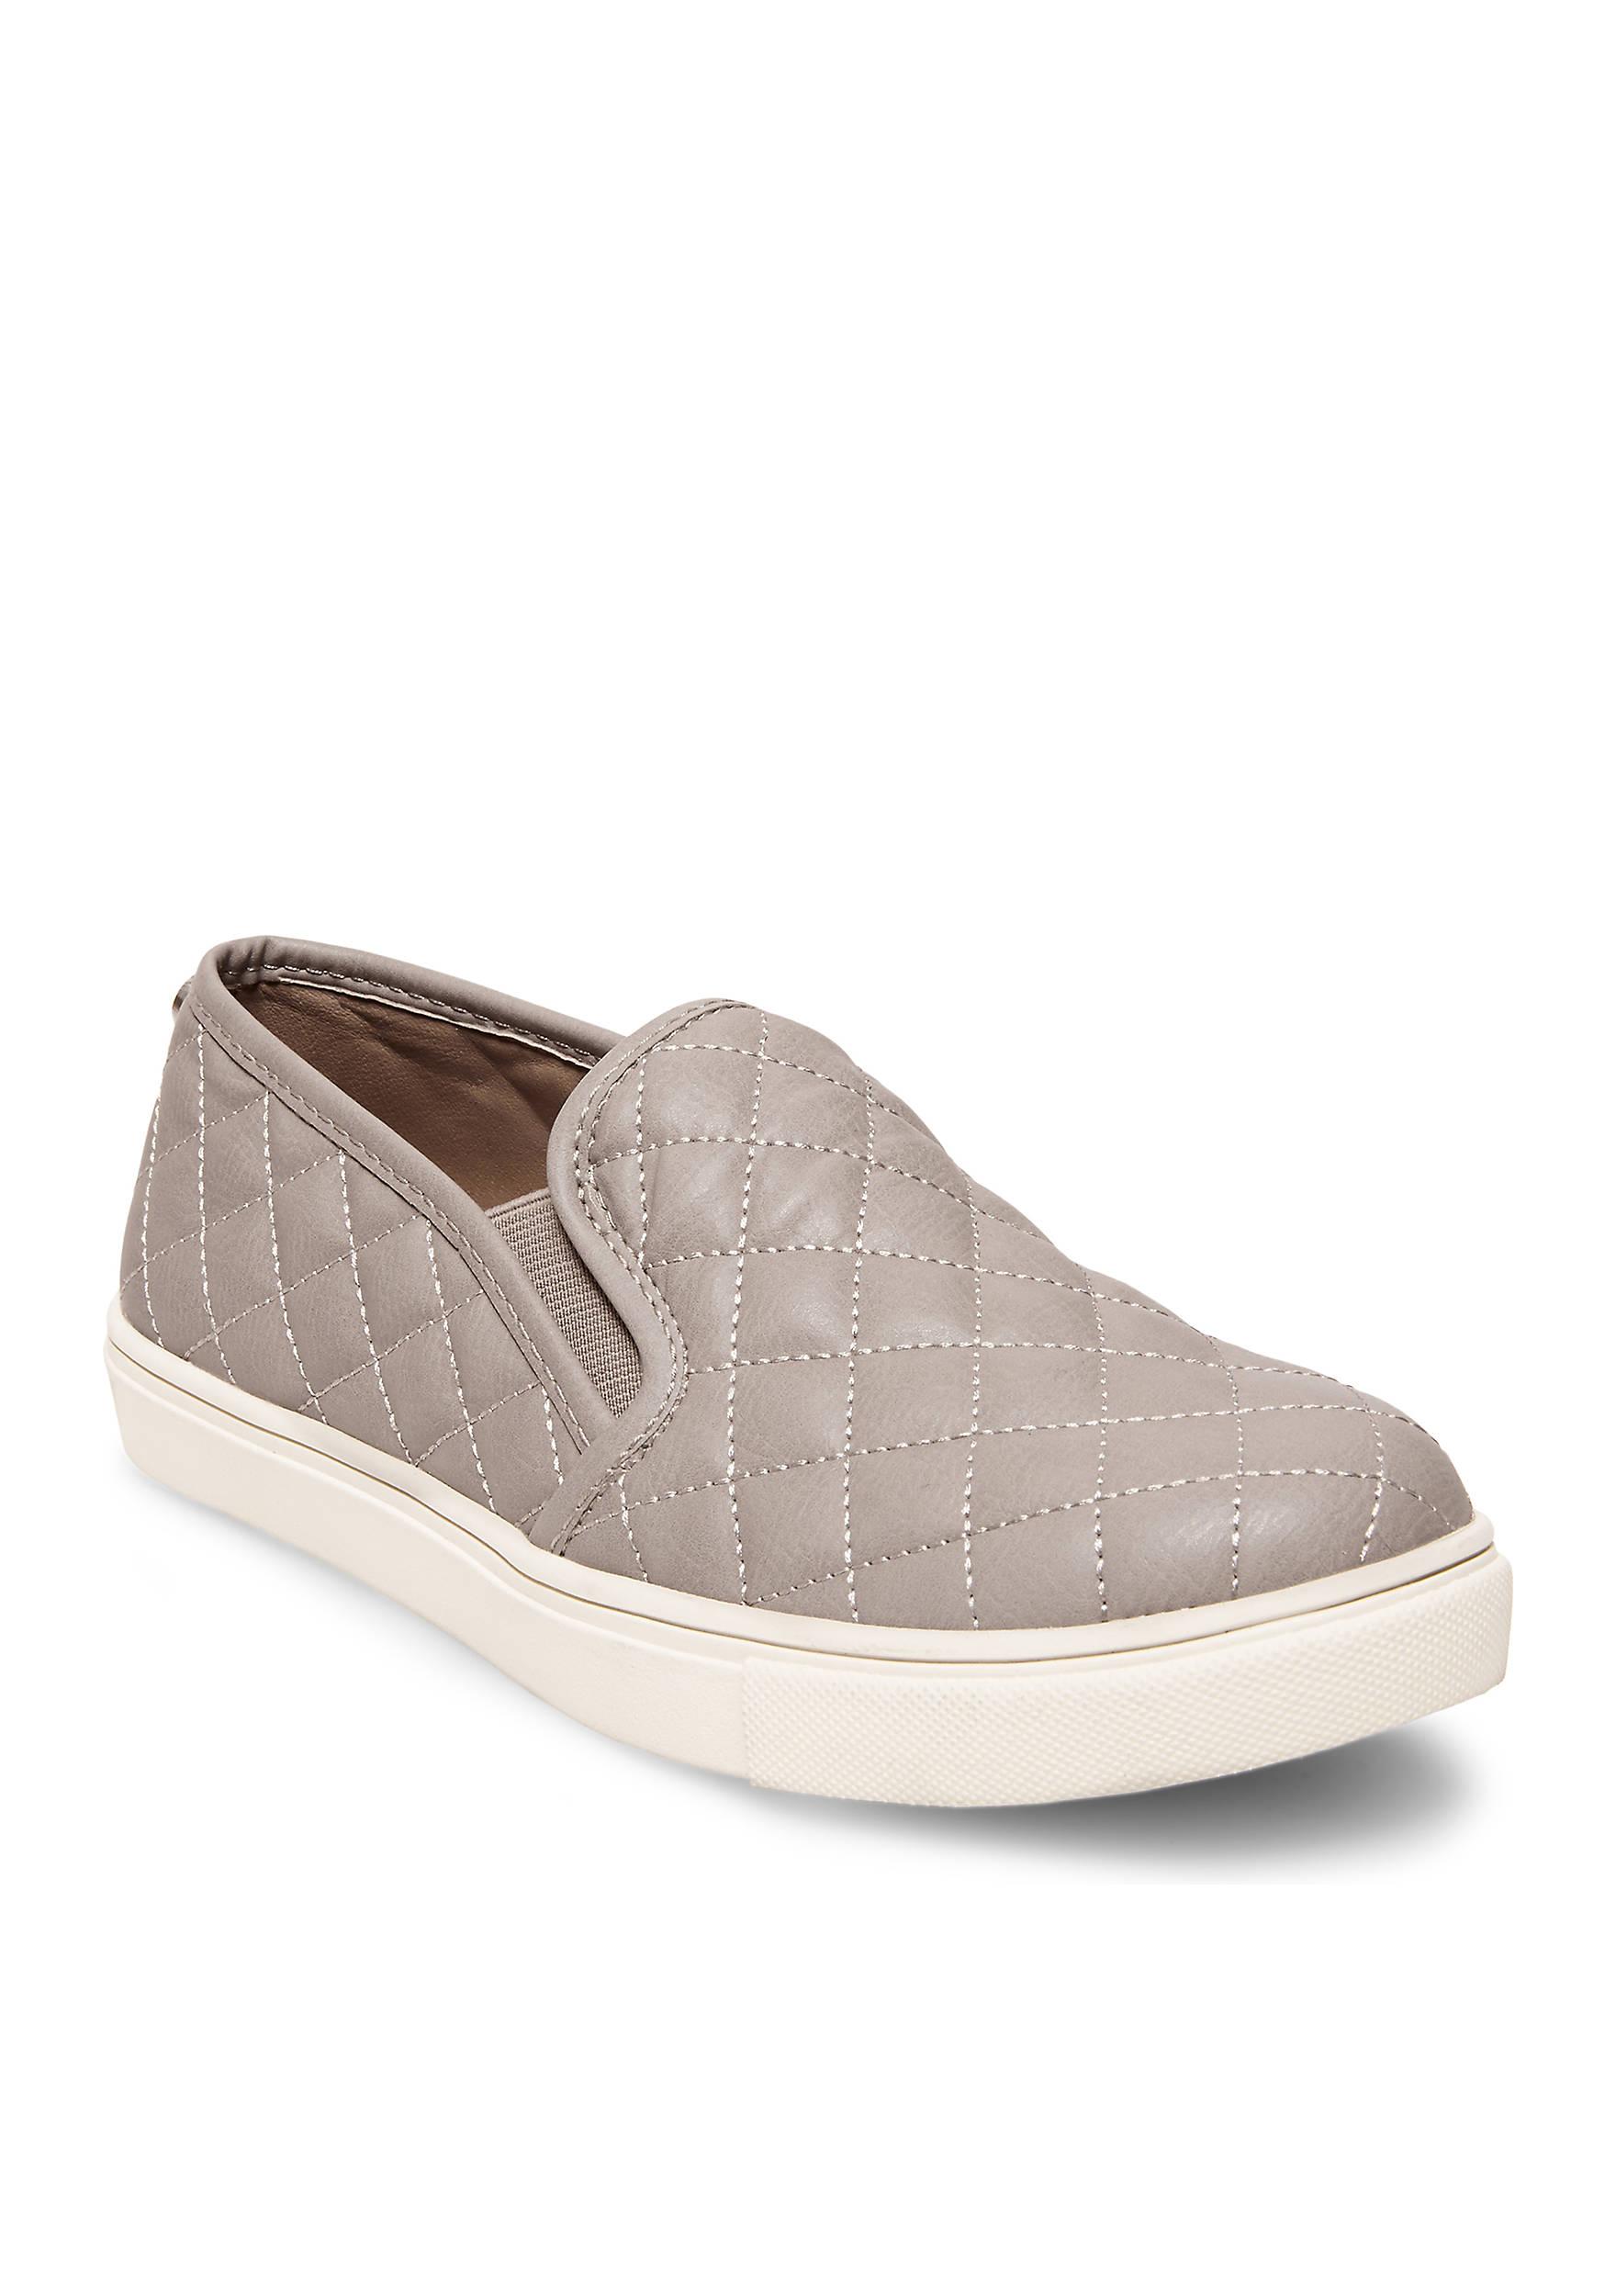 Ecentrcq Slip On Sneaker